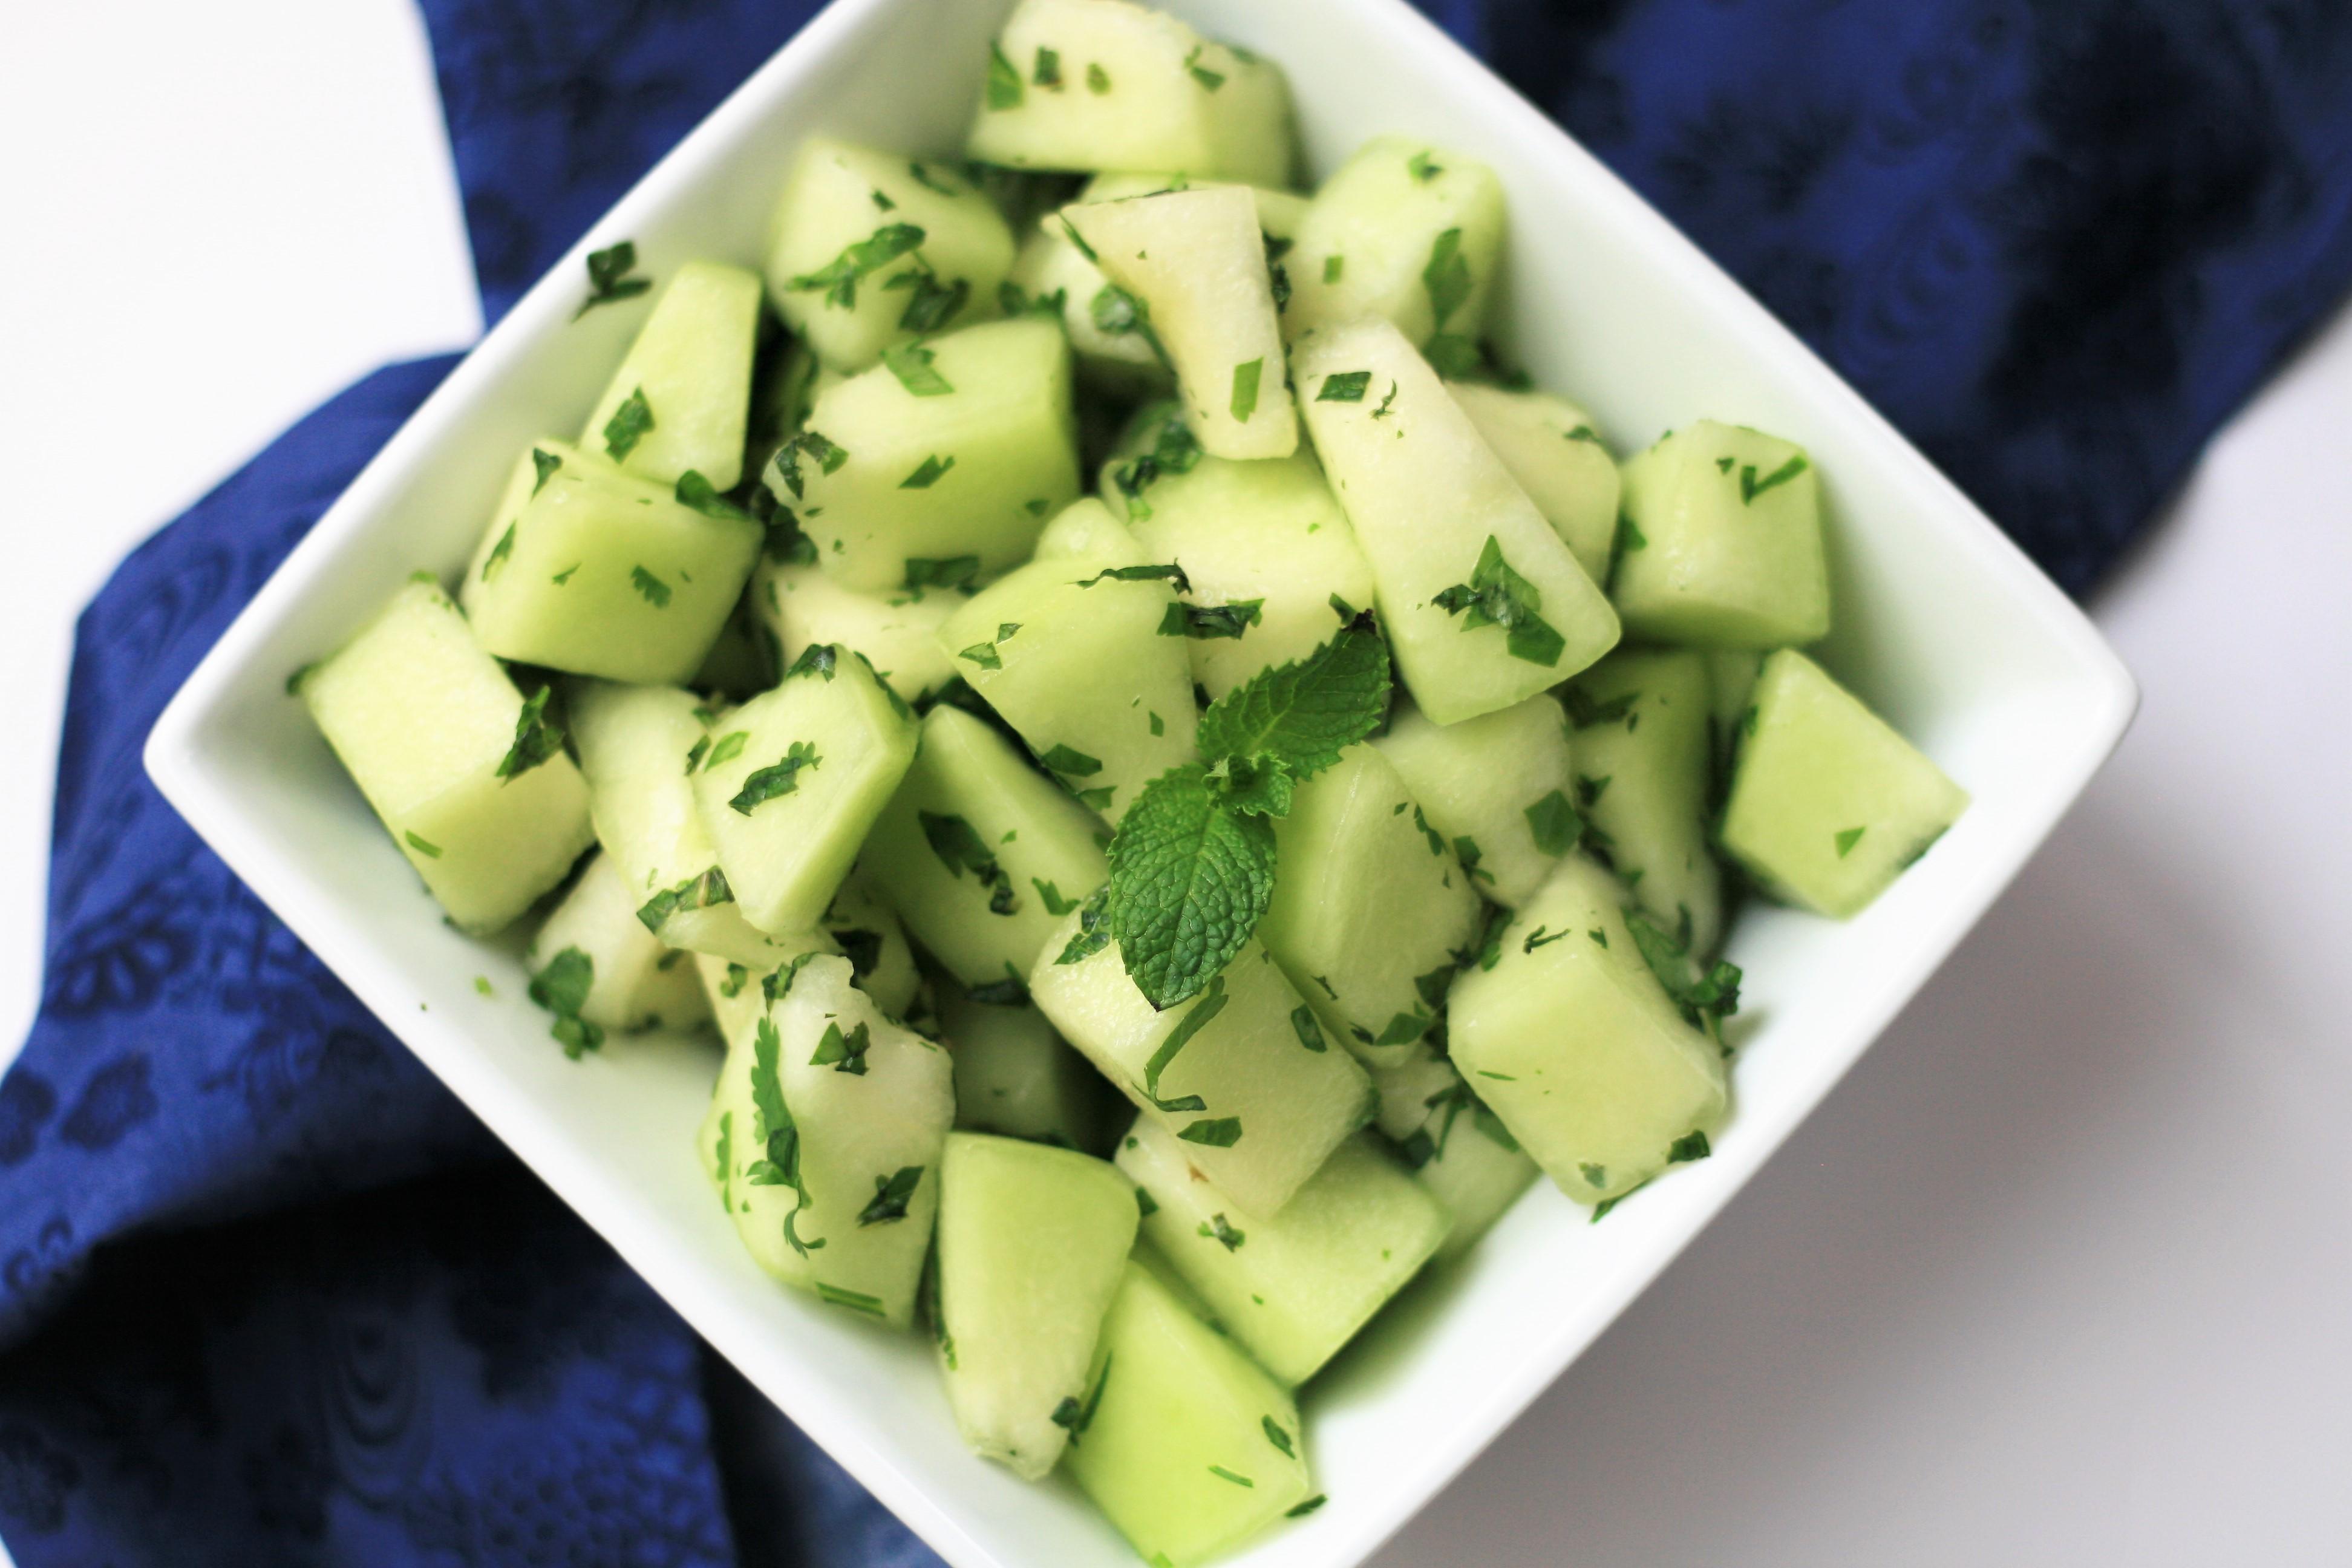 Minted Melon Summer Salad